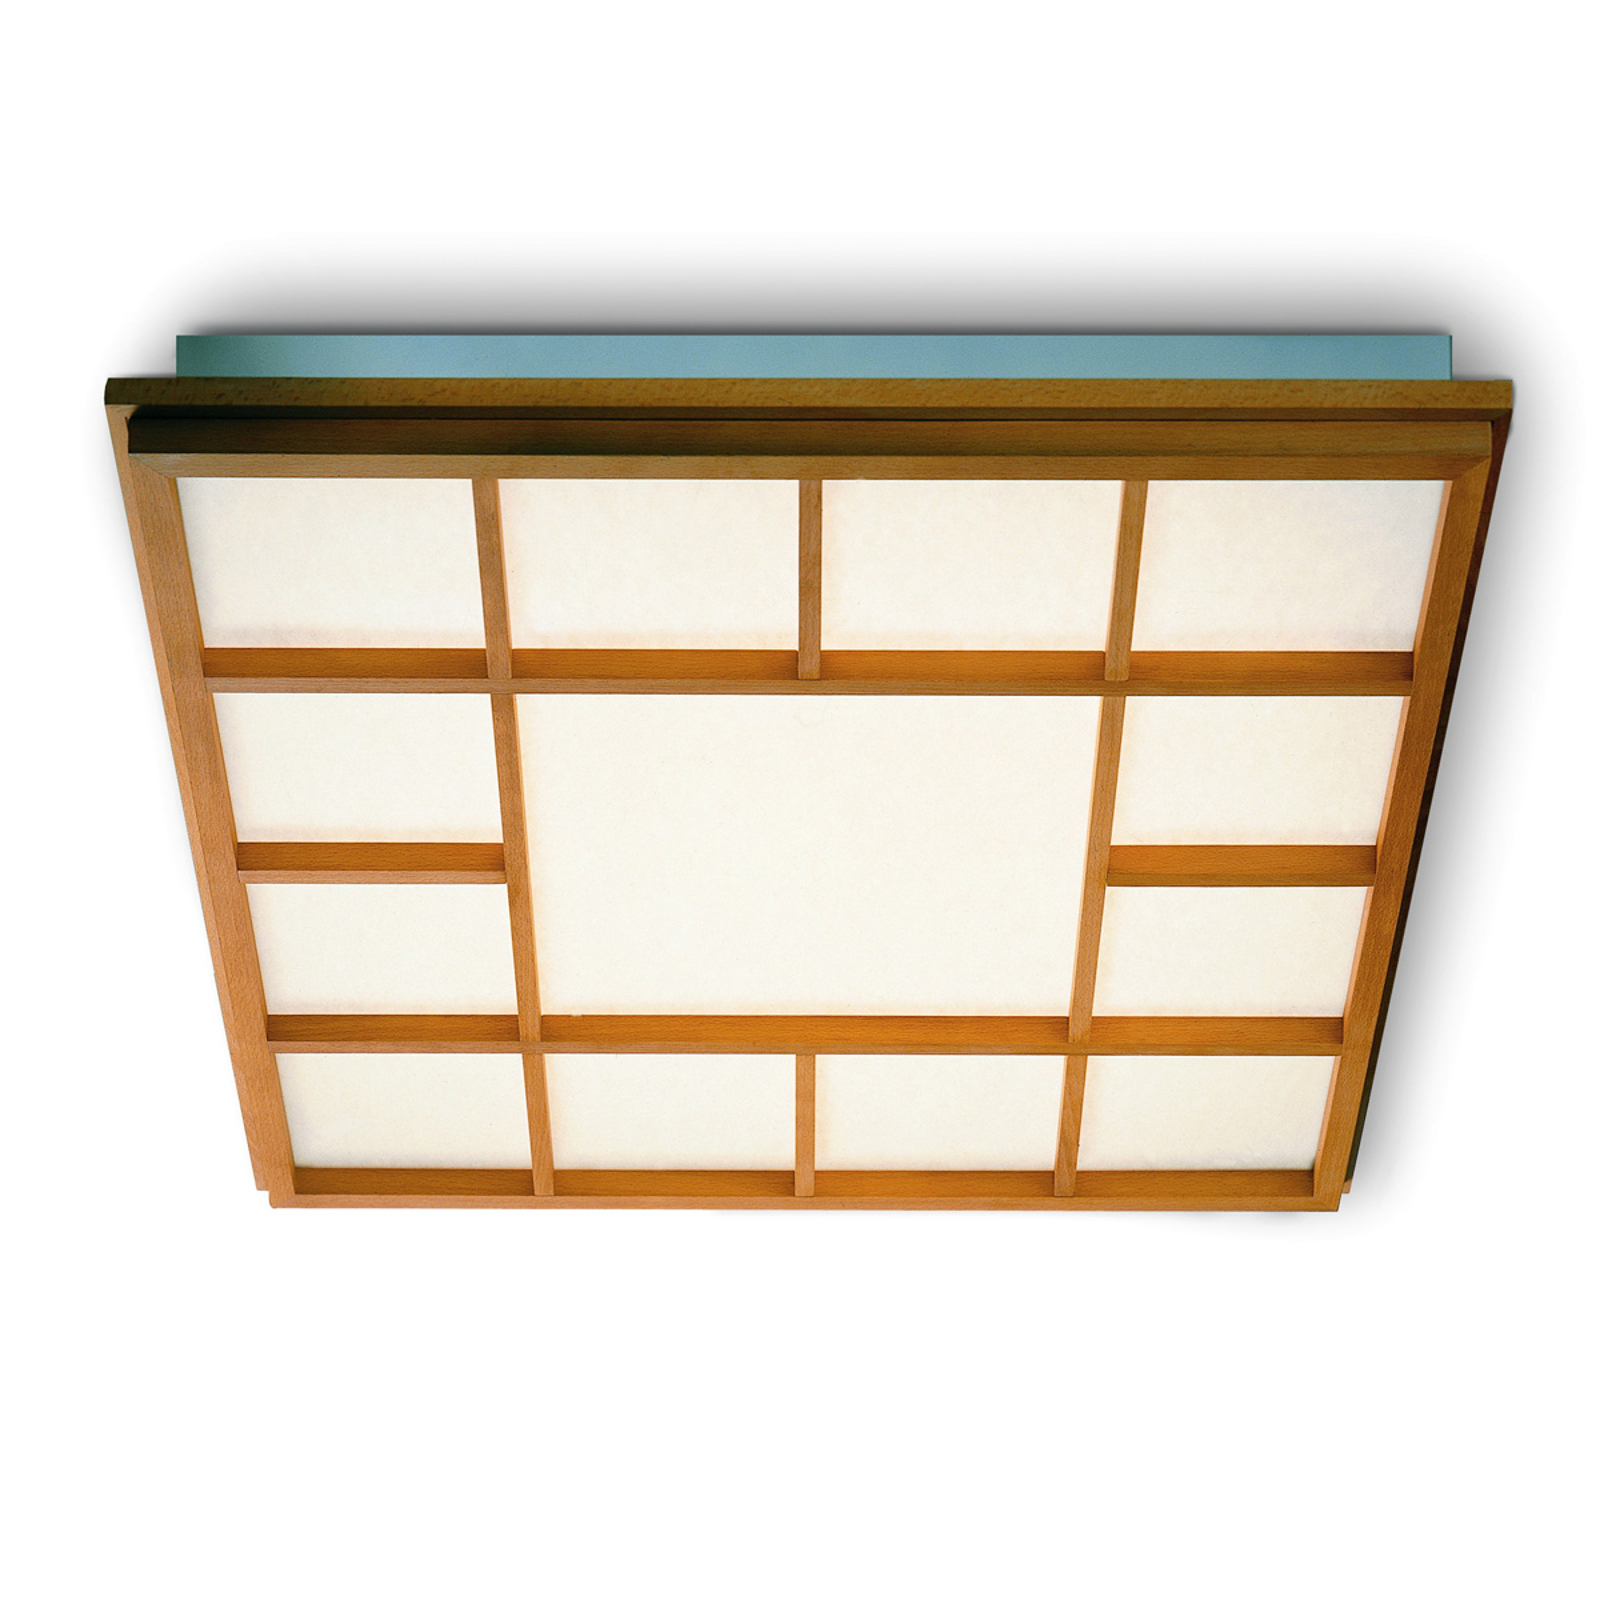 Štvorcové stropné LED svietidlo Kioto 13, buk